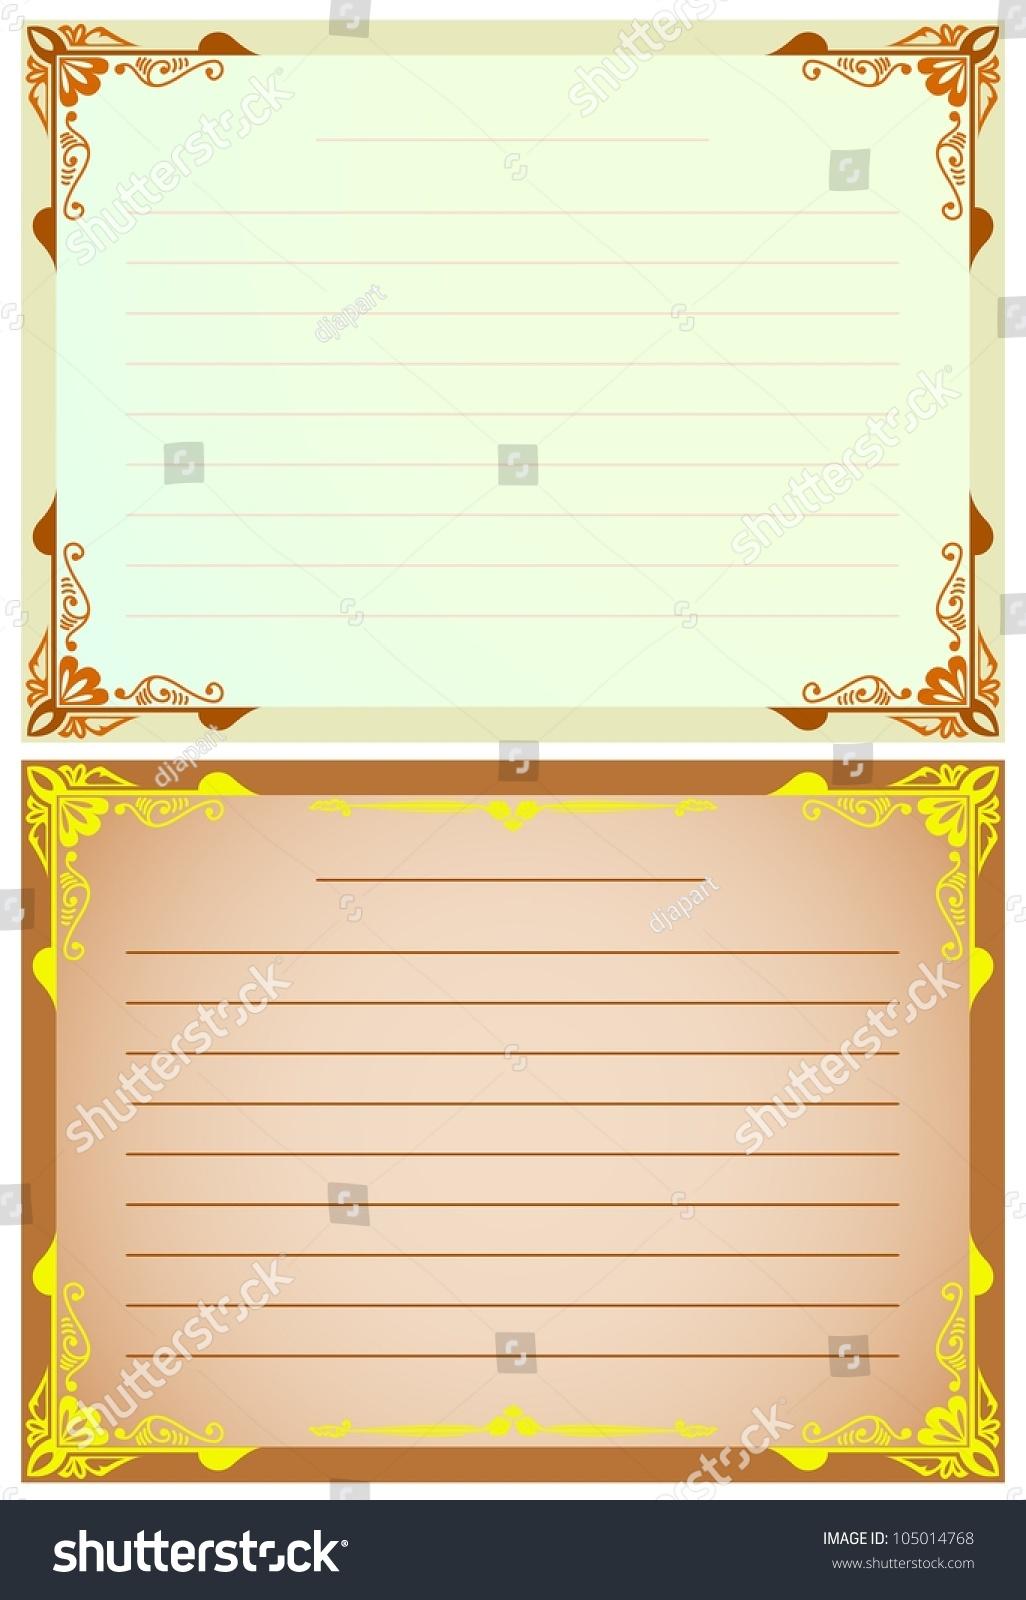 Blank Line Paper Border Ornament Stock Vector (2018) 105014768 ...